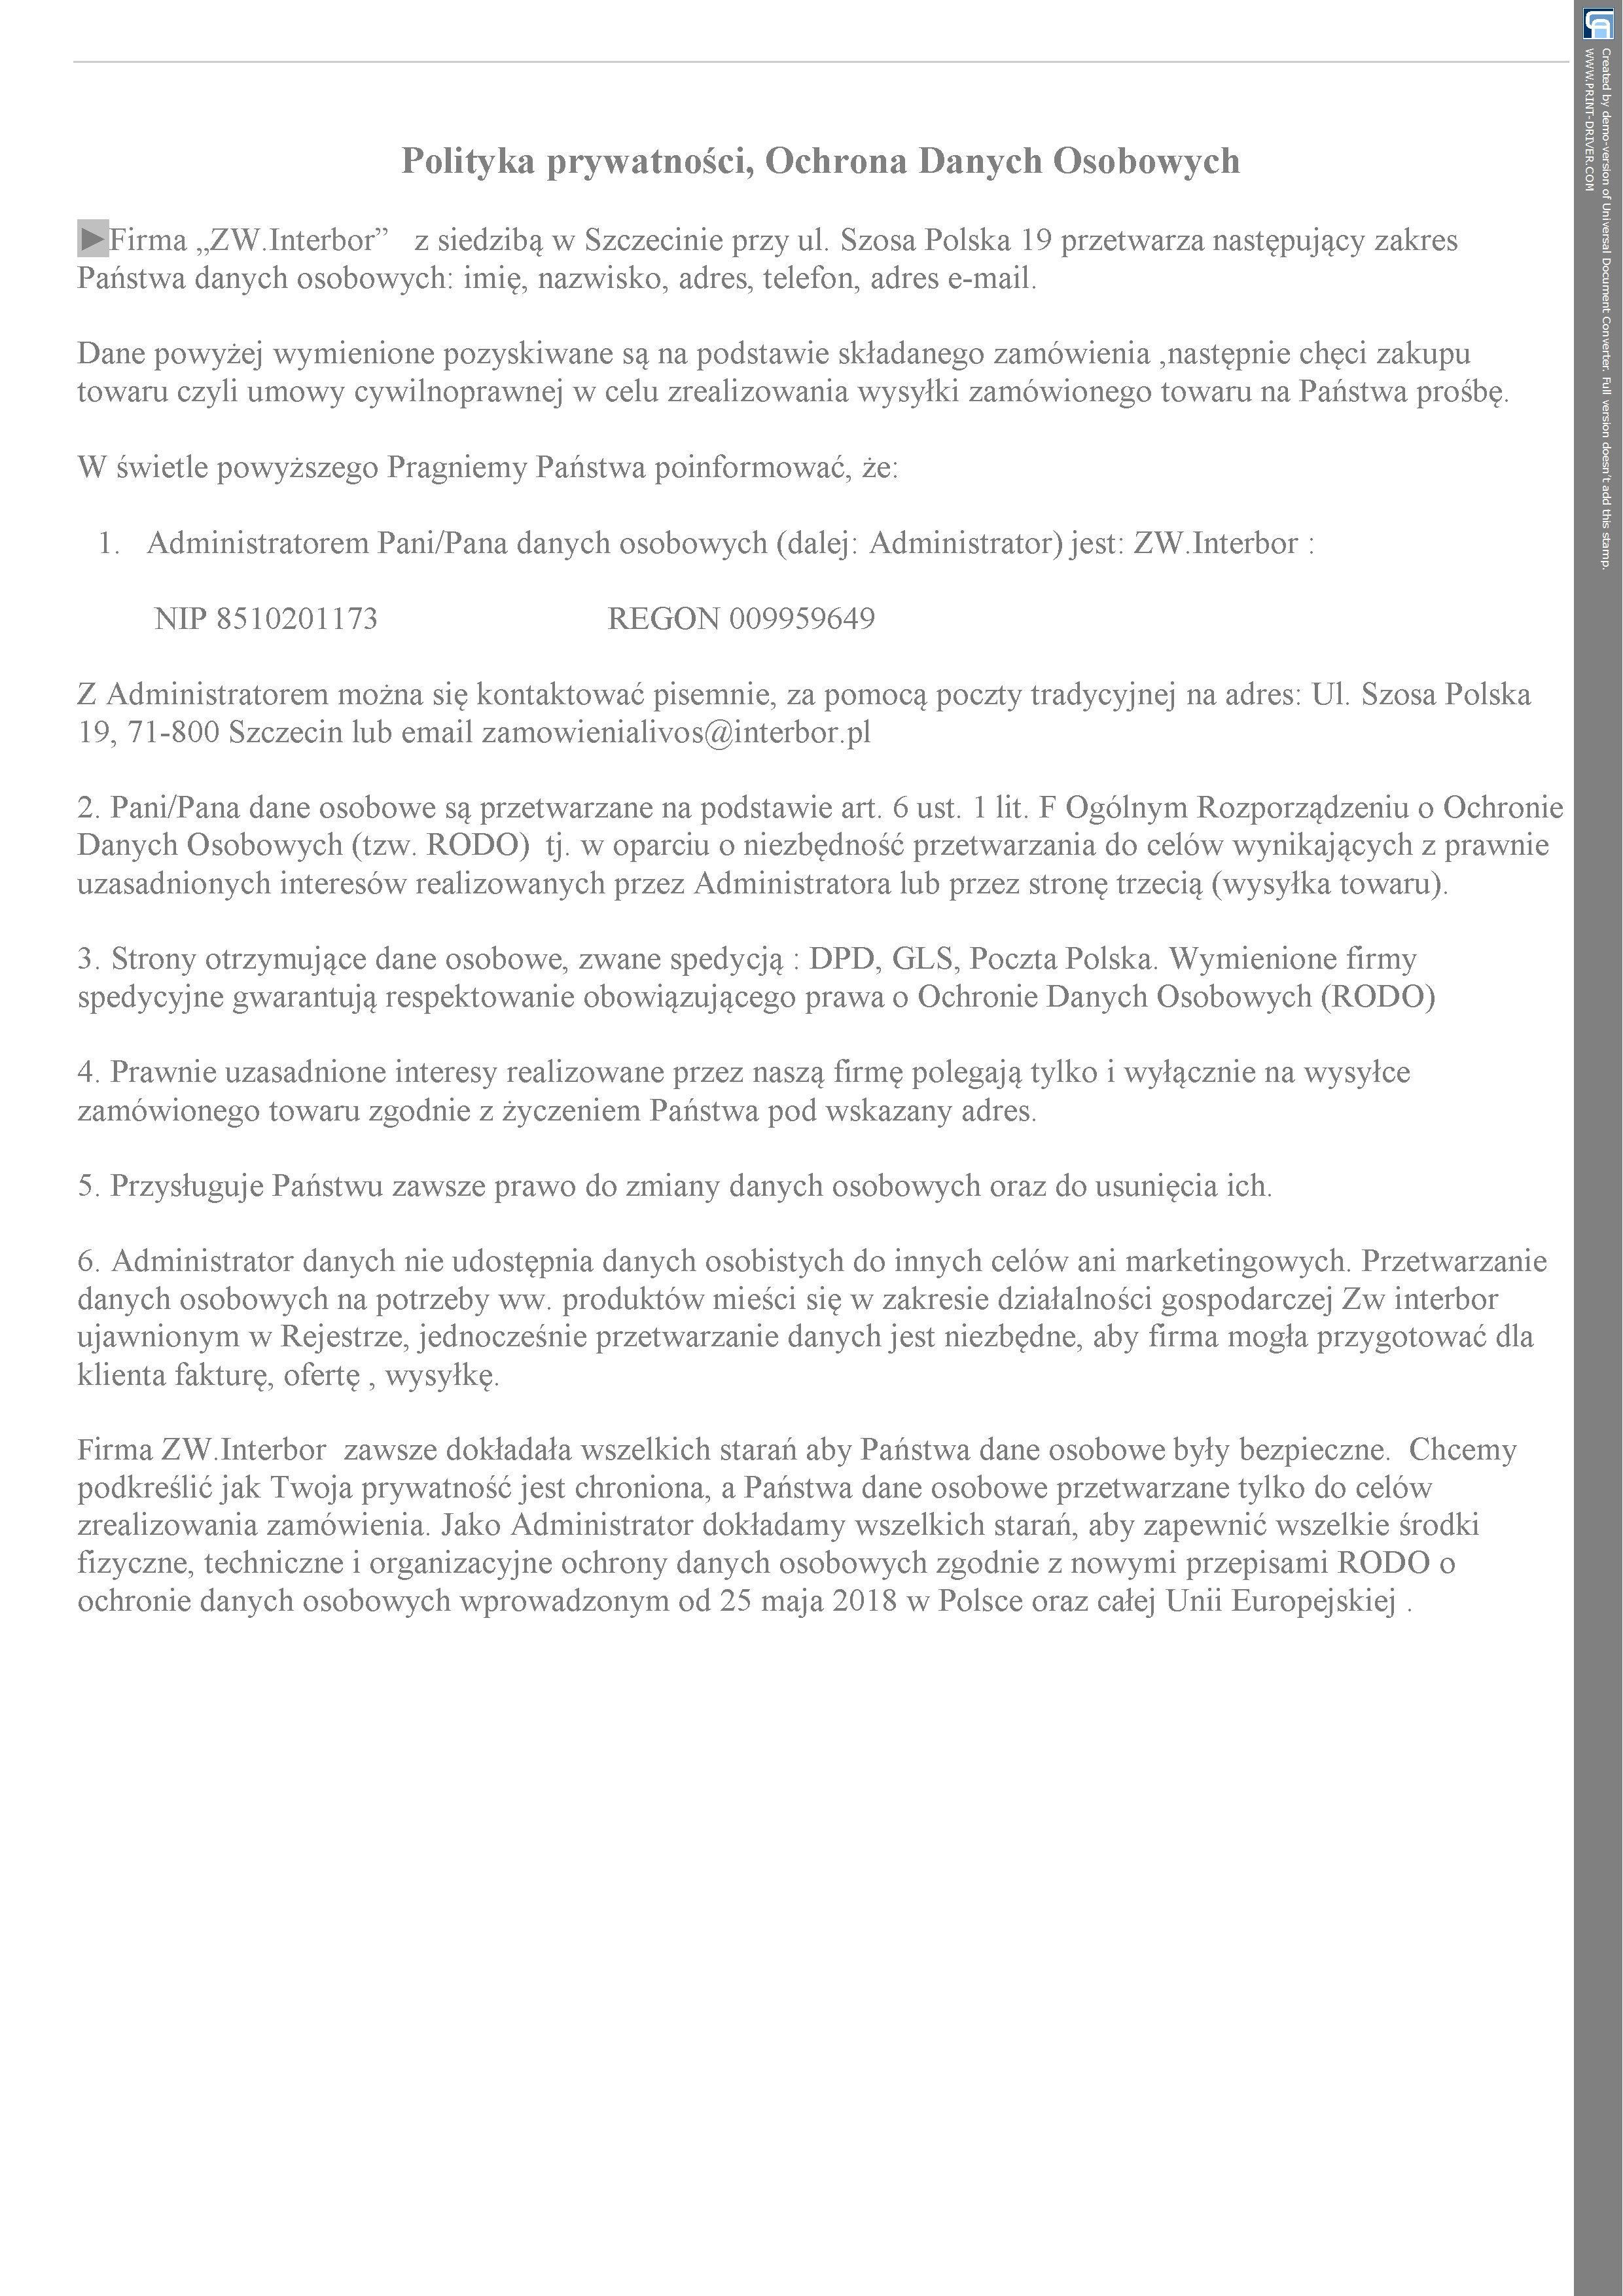 Regulamin zakupw 25 maj 20183jpg  str 4 wwwjpg